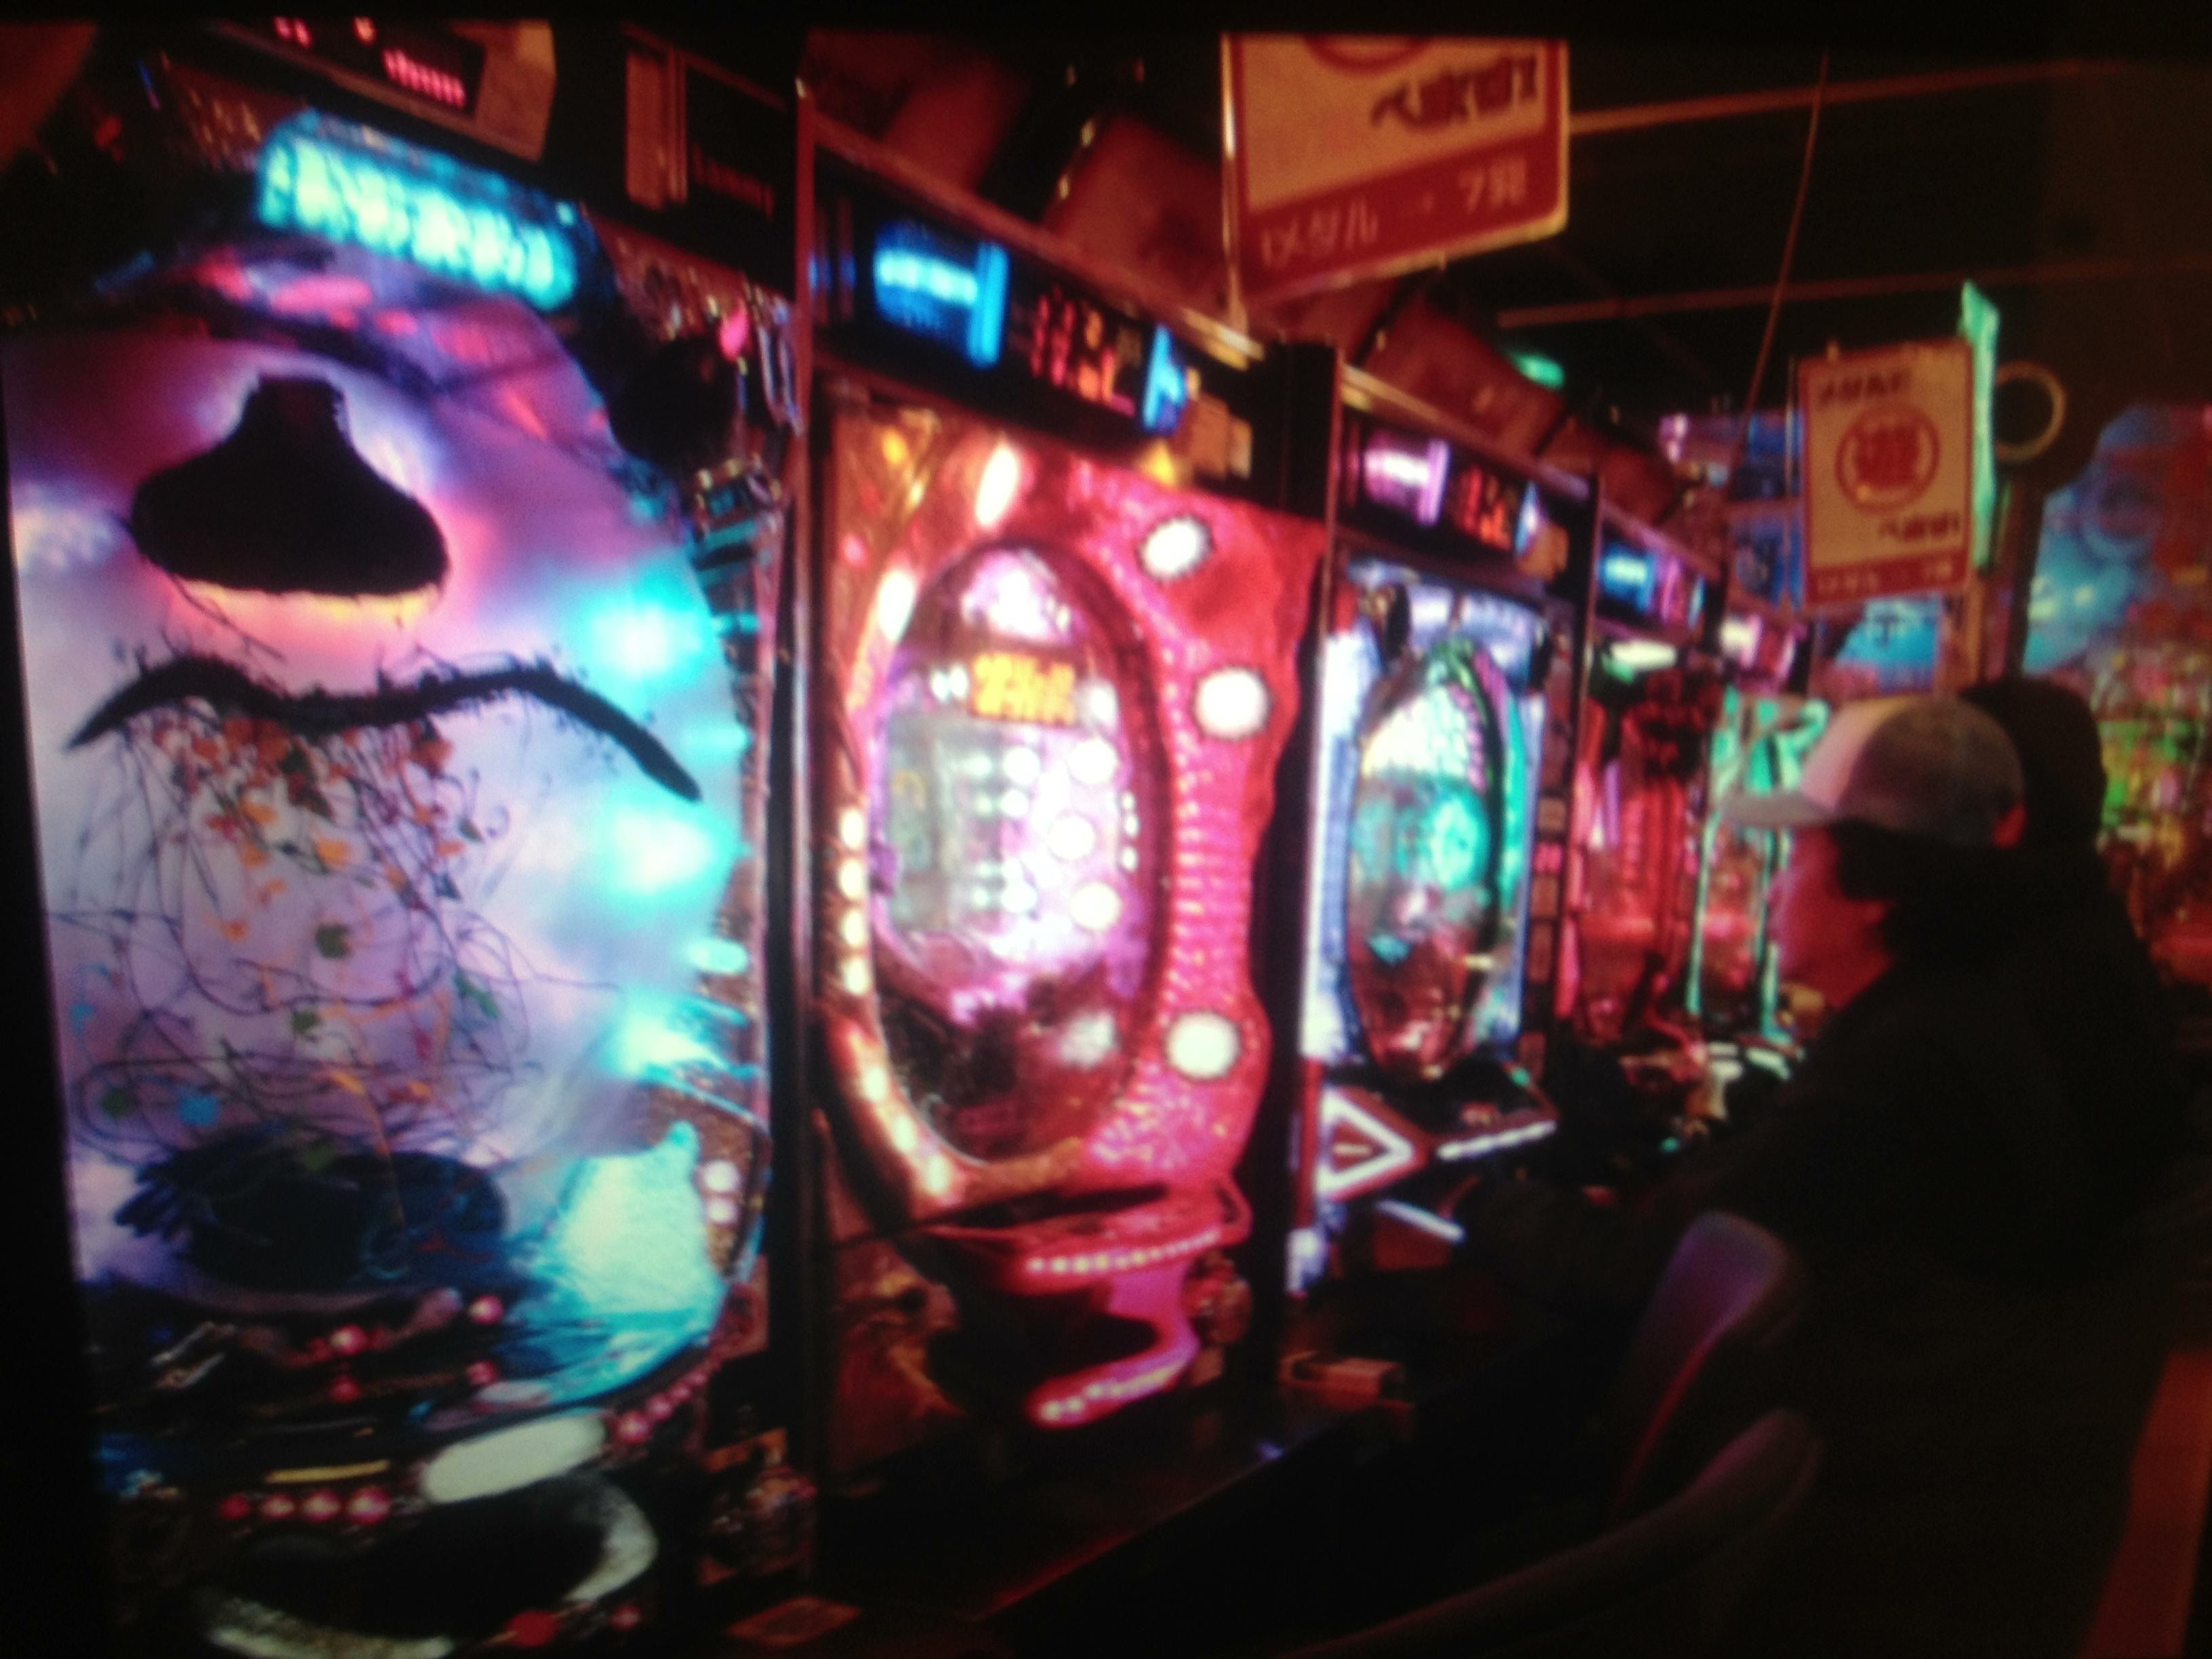 Gambling. Dopamine.Sex. Drugs. Art. X-mas plans in Japan?